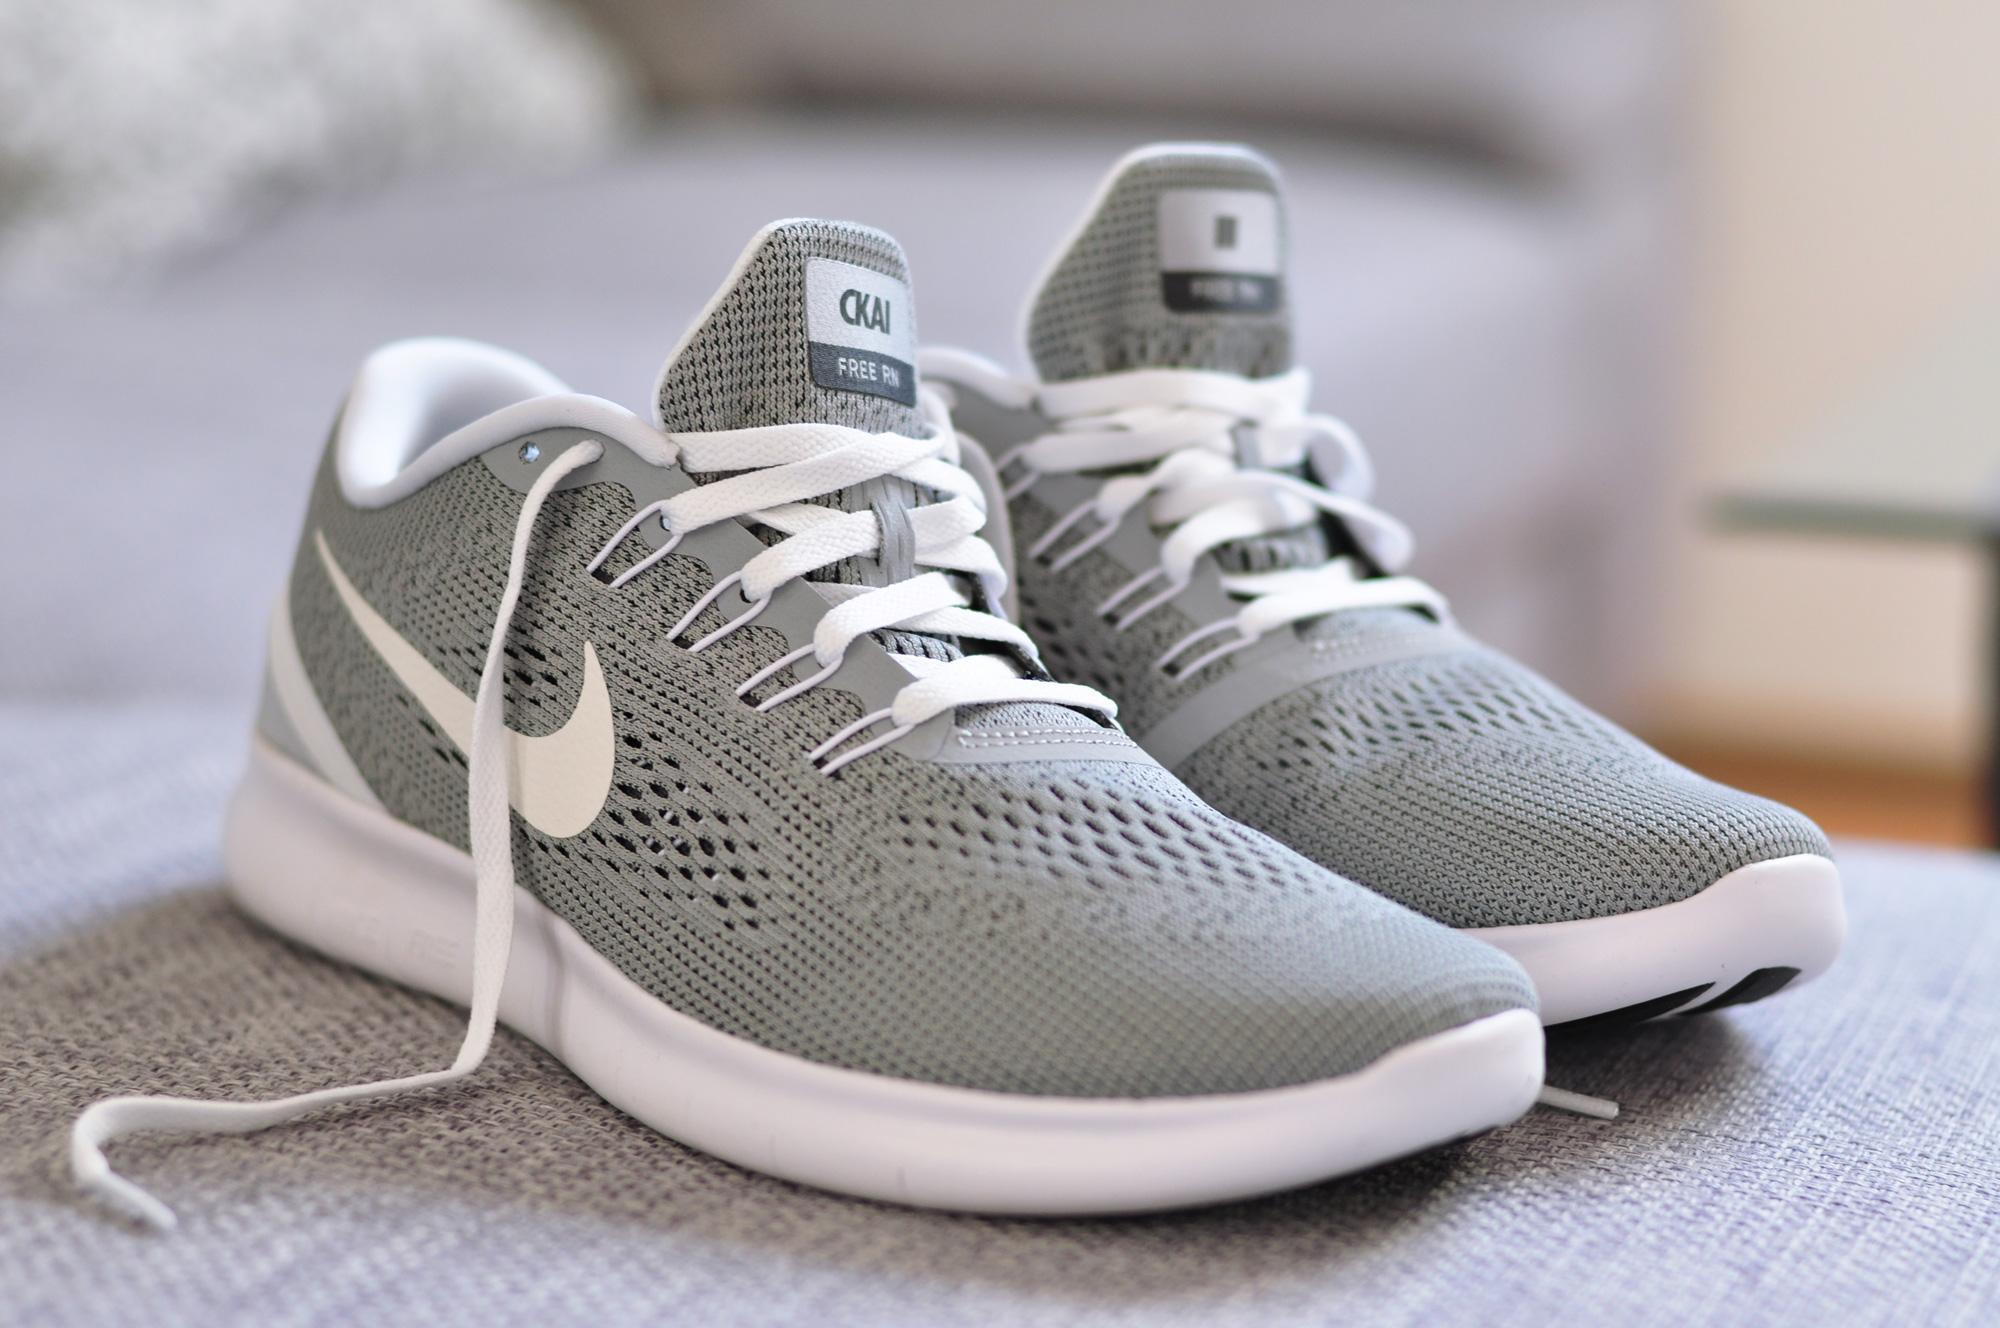 Schuhe Von Von Schuhe Von Luftige Schuhe Schuhe Nike Luftige